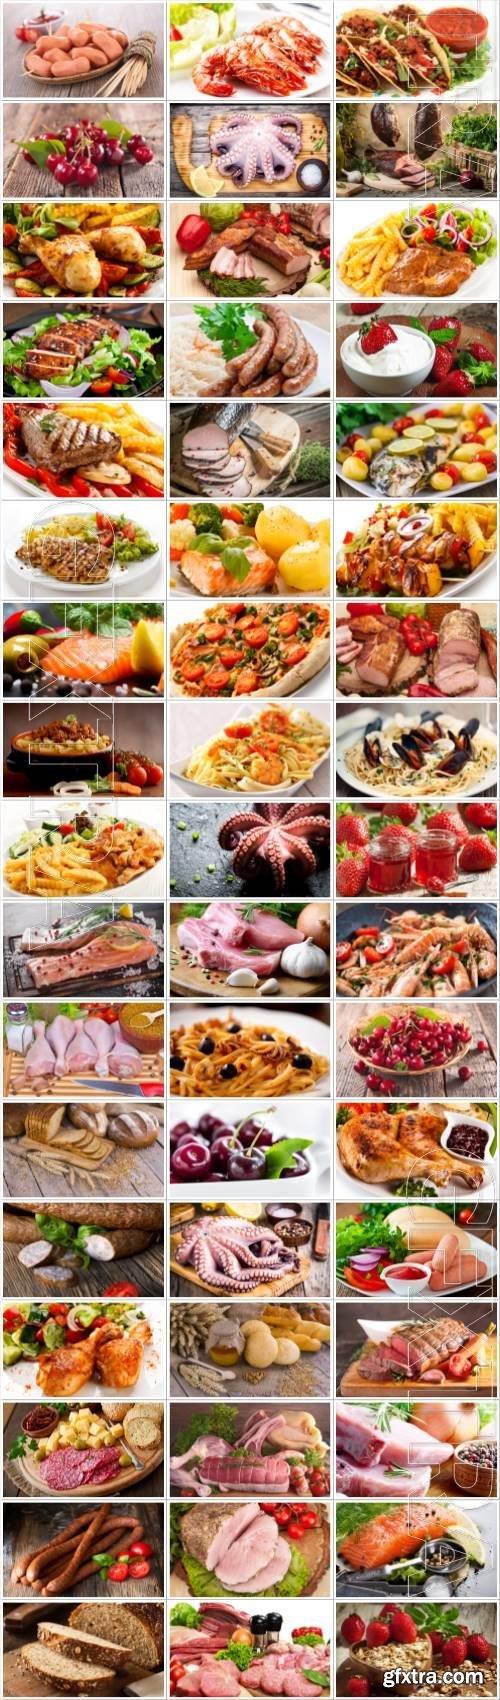 Food large selection stock photos